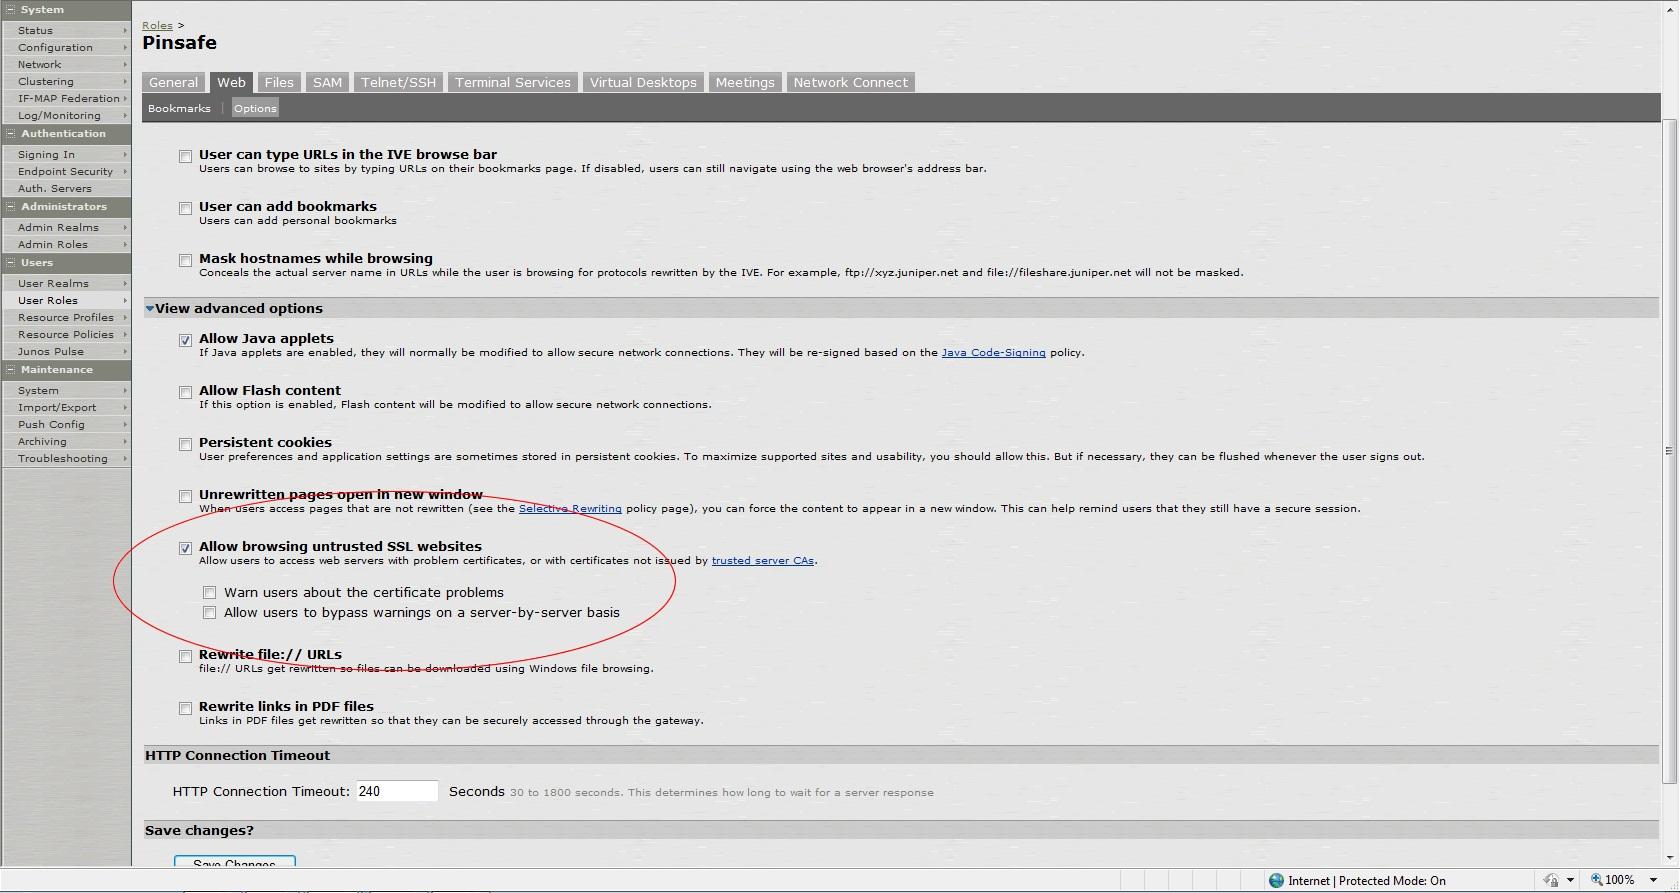 Juniper SA 7 x Integration - Swivel Knowledgebase